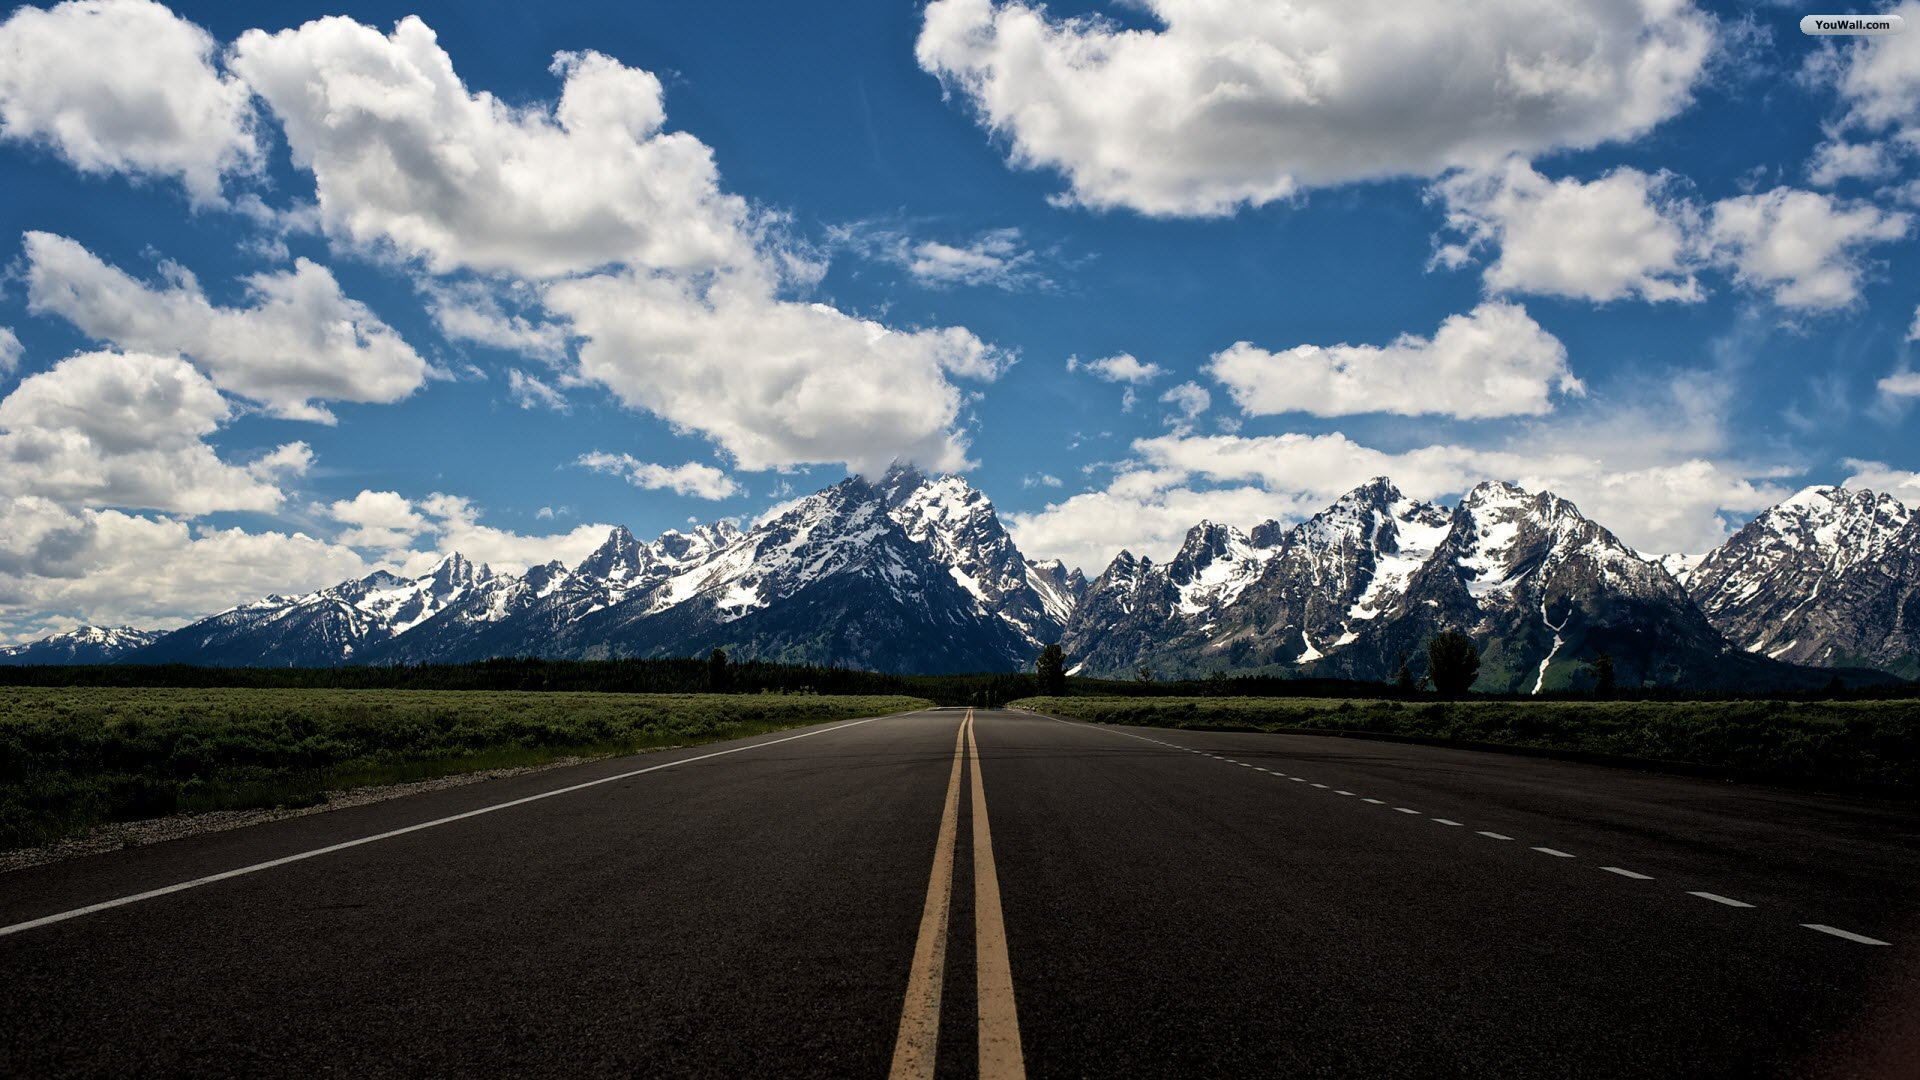 Mountain Road Wallpaper